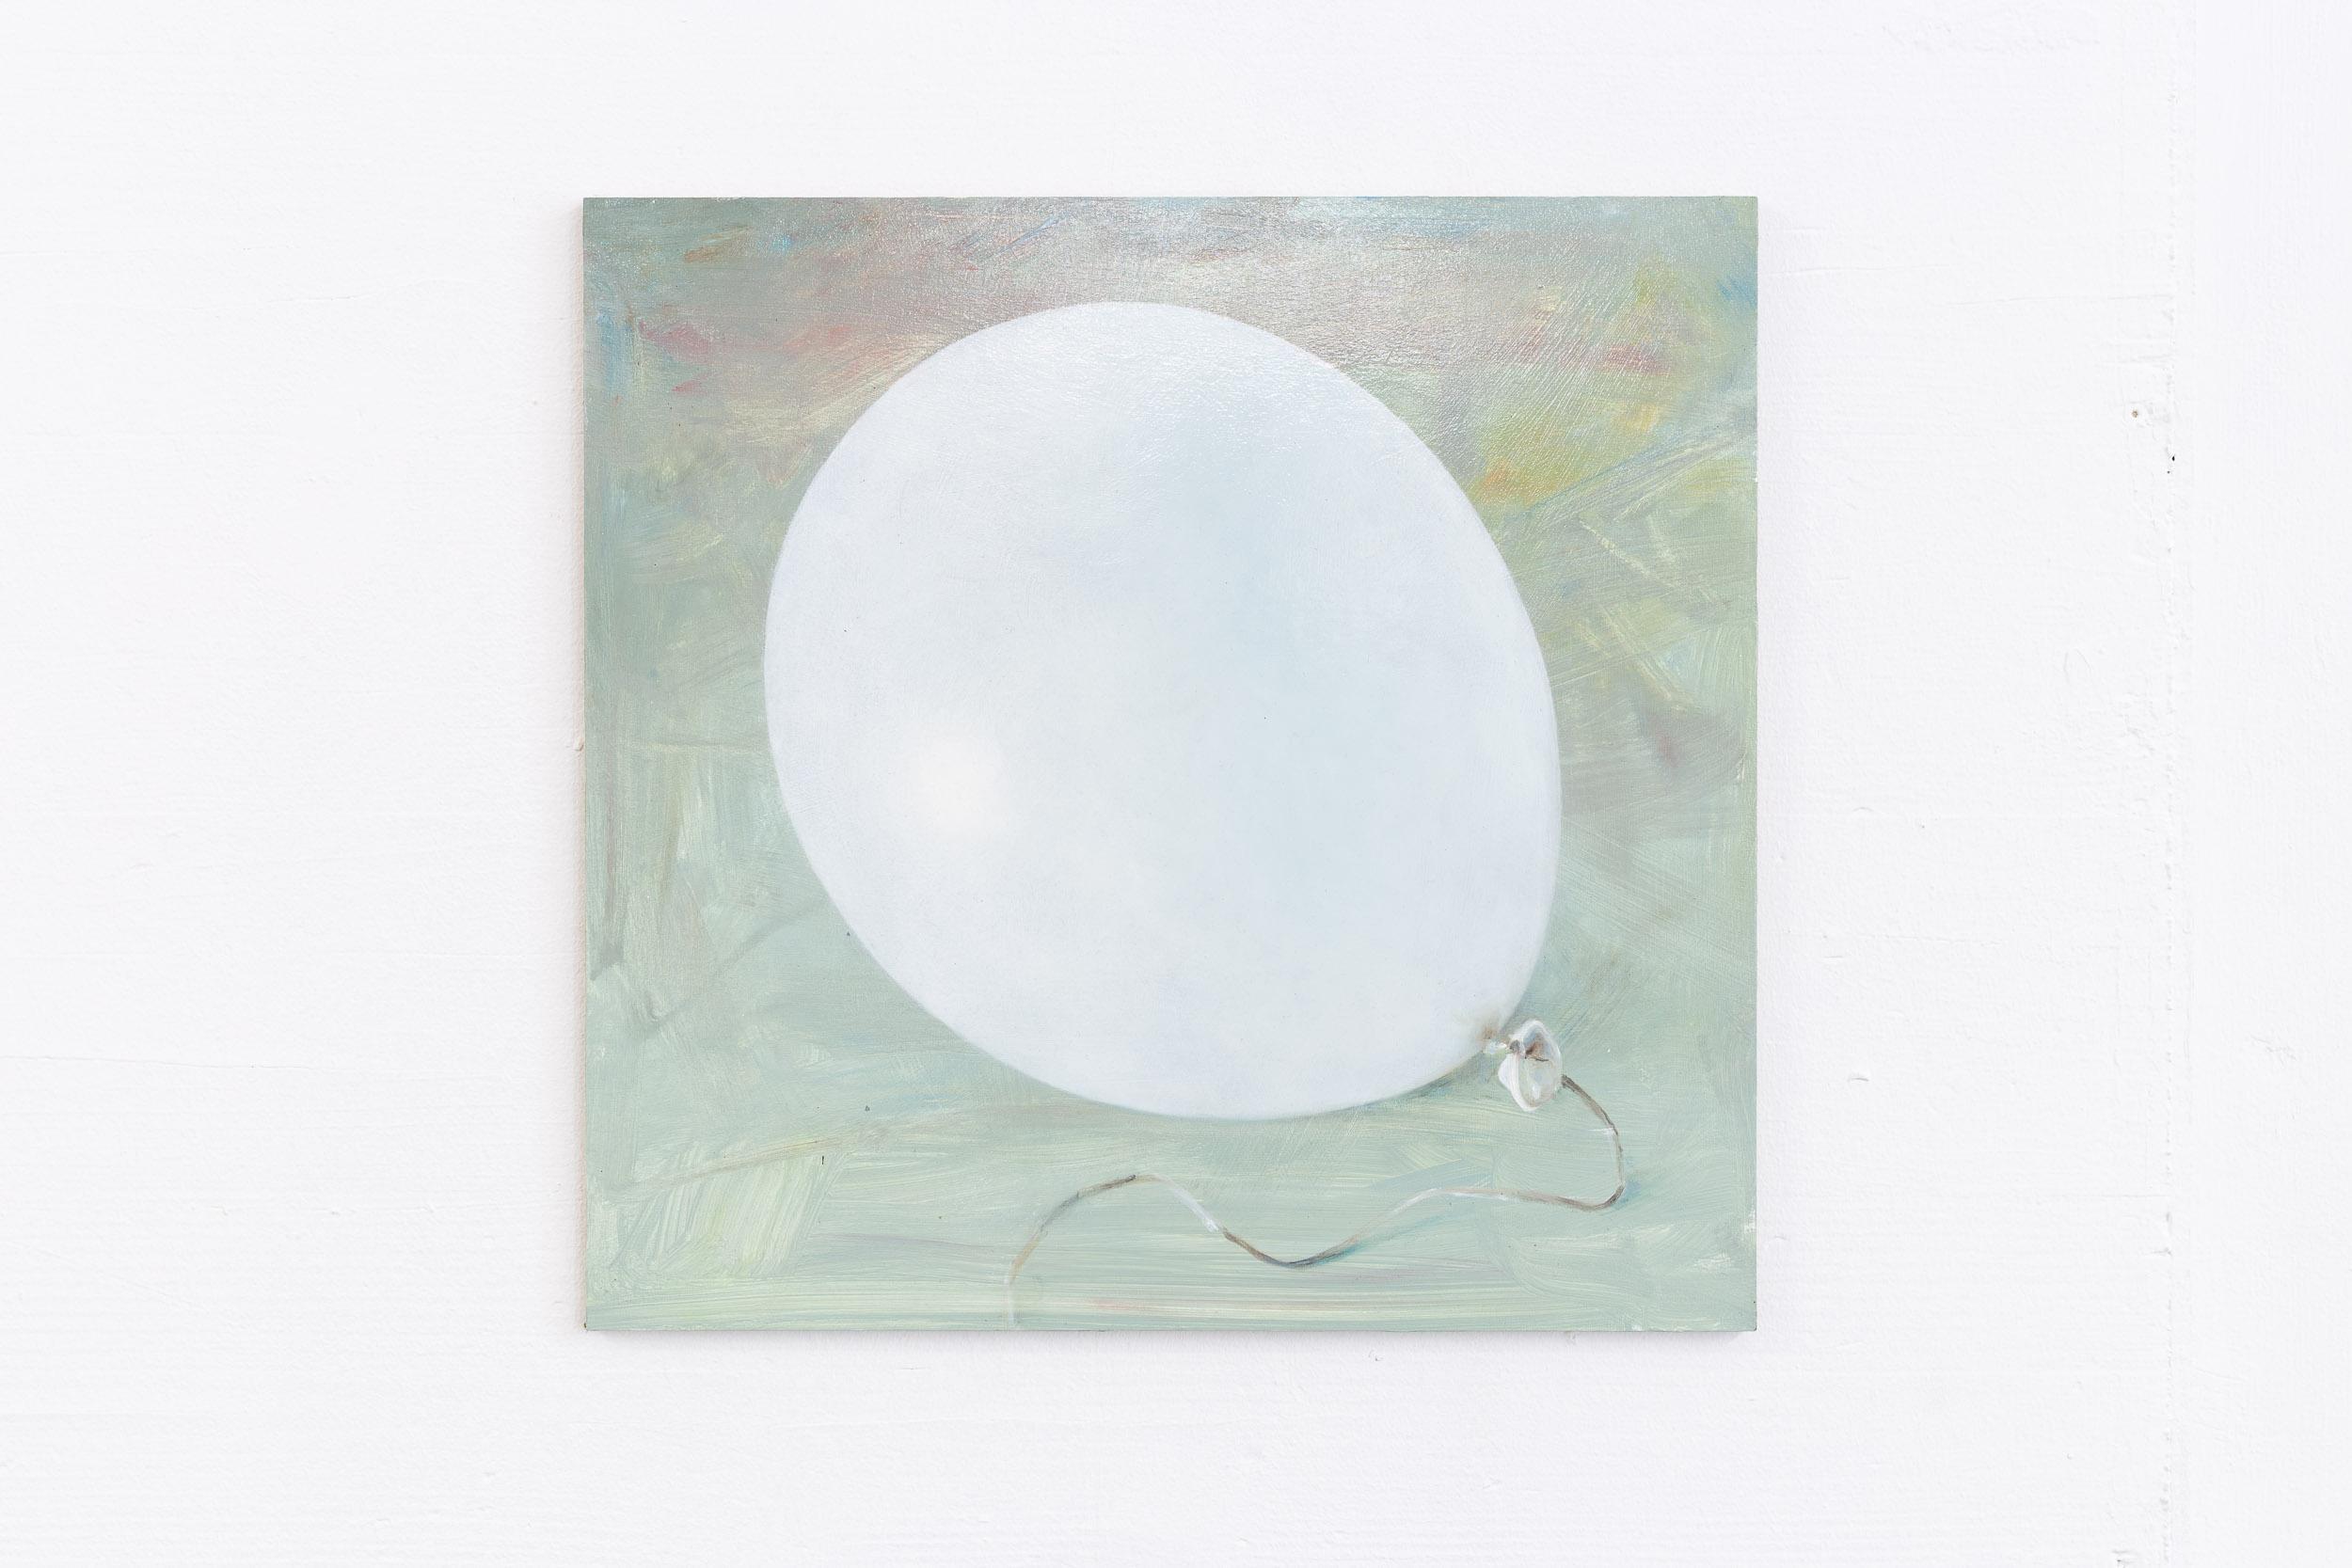 Francisco Sierra,  Untitled (White Baloon) , 2017, oil on wood, 44 x 45 cm  Photo: Kilian Bannwart